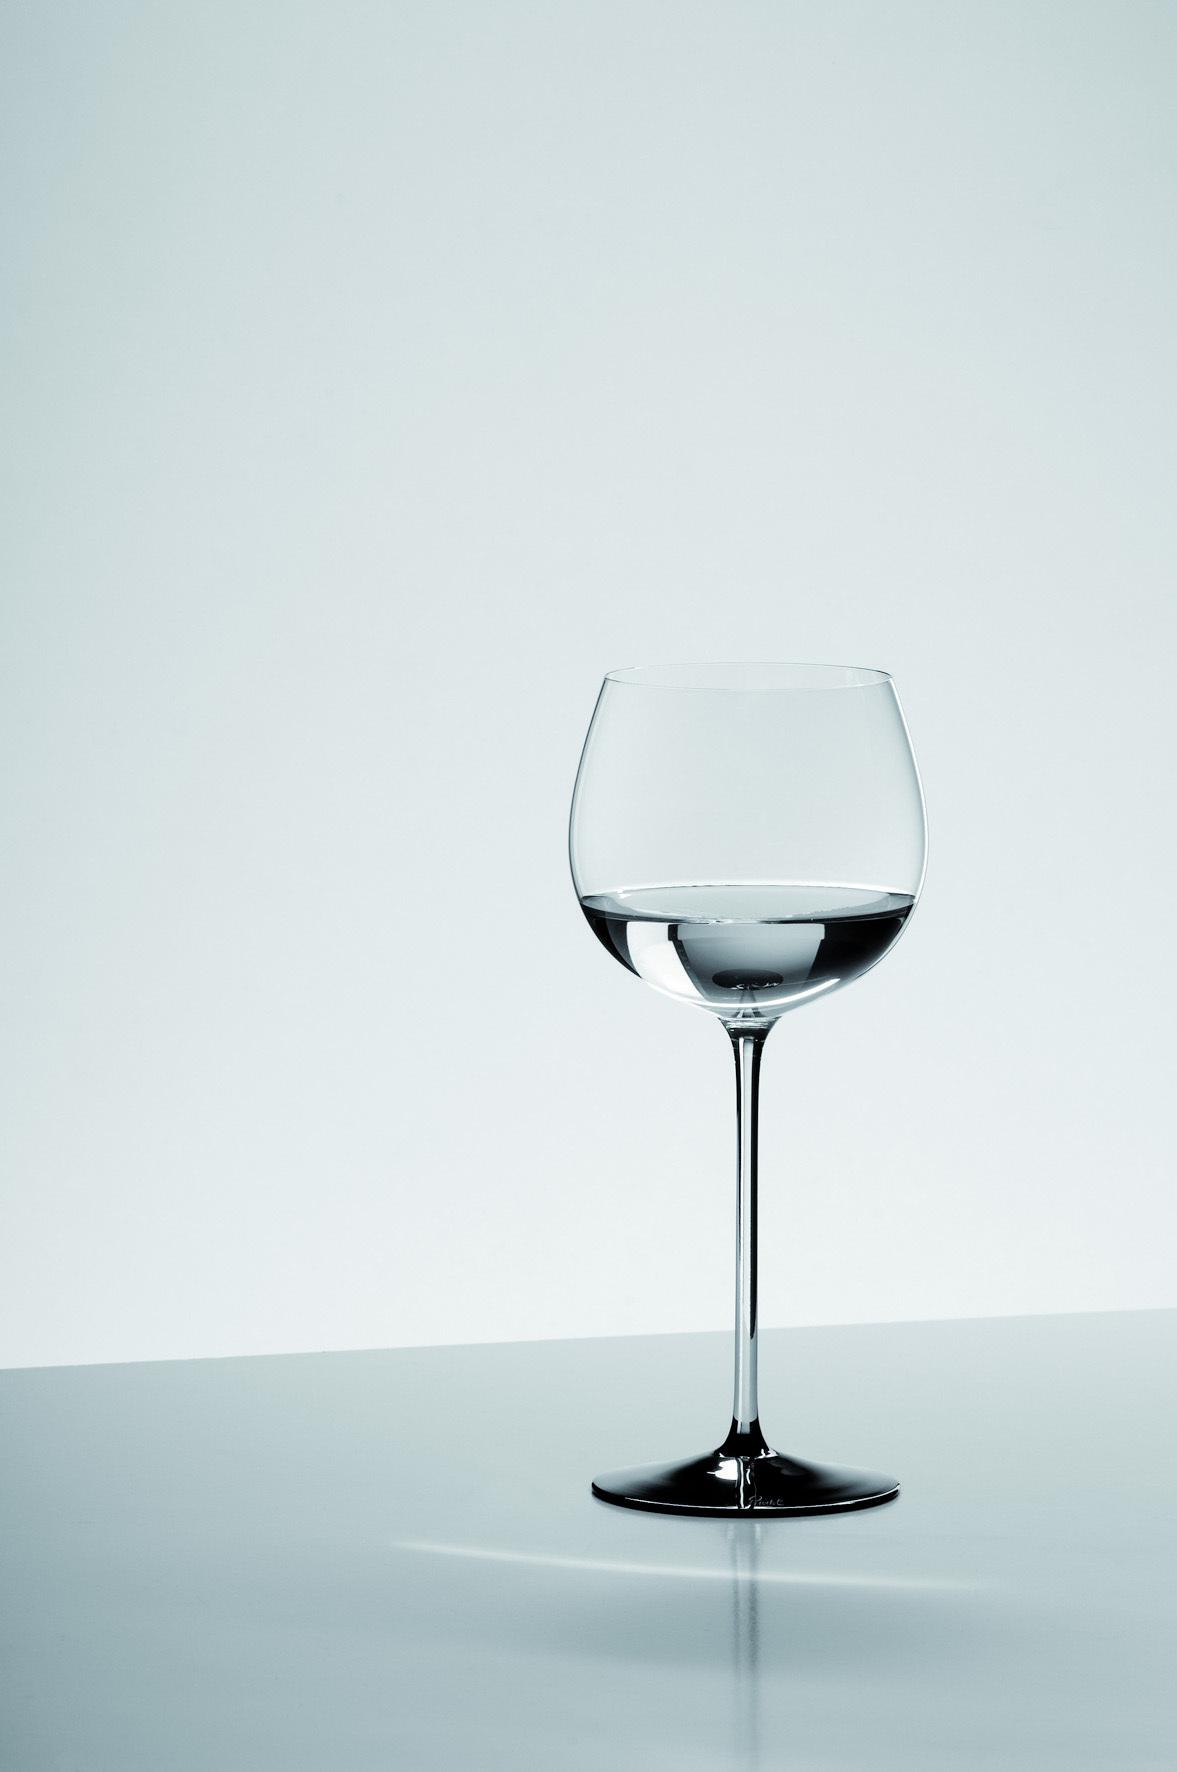 Бокалы Бокал для белого вина 500мл Riedel Sommeliers Black Tie Montrachet Хрустальное стекло bokal-dlya-belogo-vina-500-ml-riedel-montrachet-black-tie-avstriya.jpg